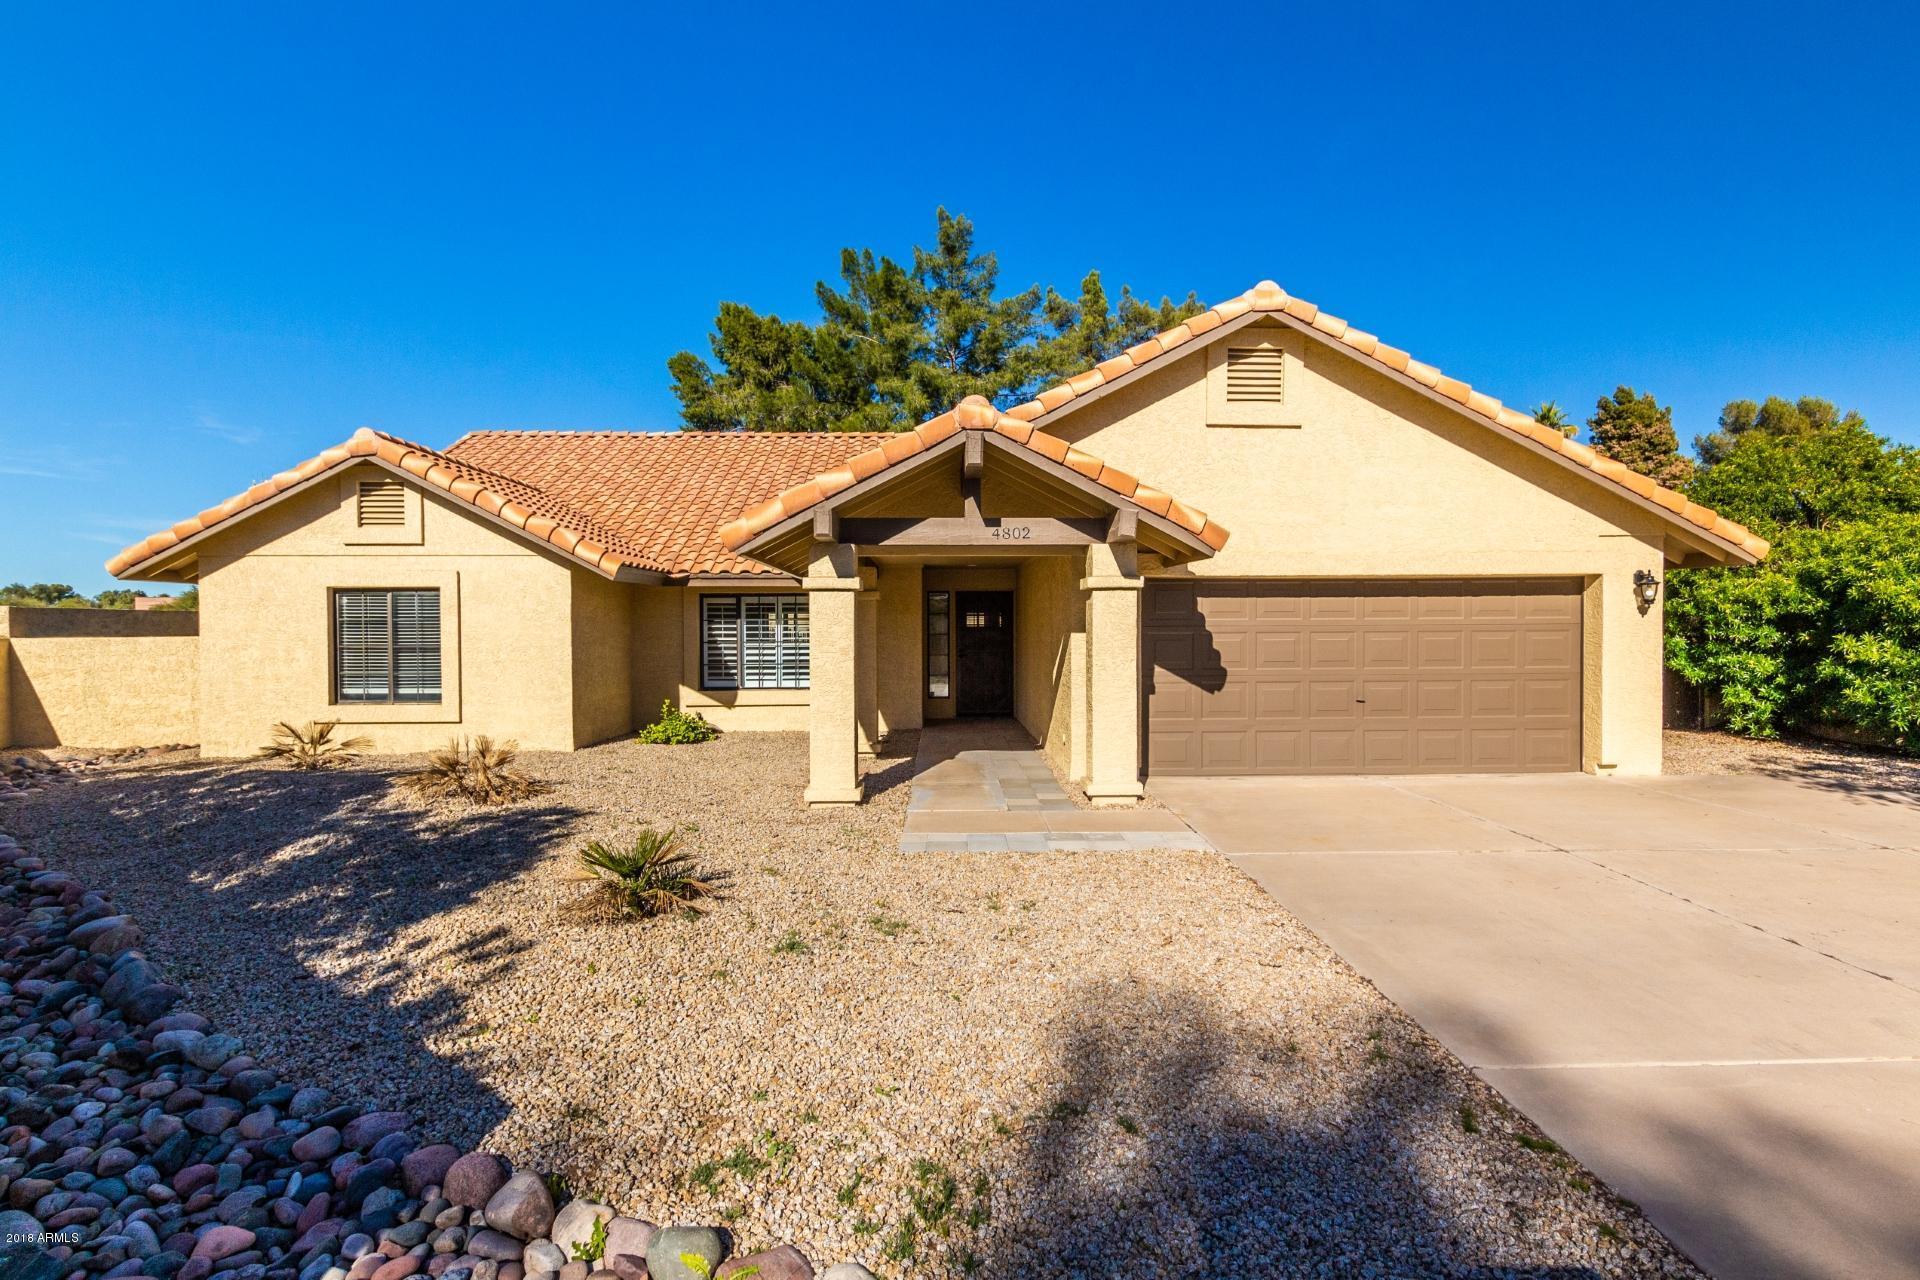 Photo of 4802 E HILLERY Drive, Scottsdale, AZ 85254